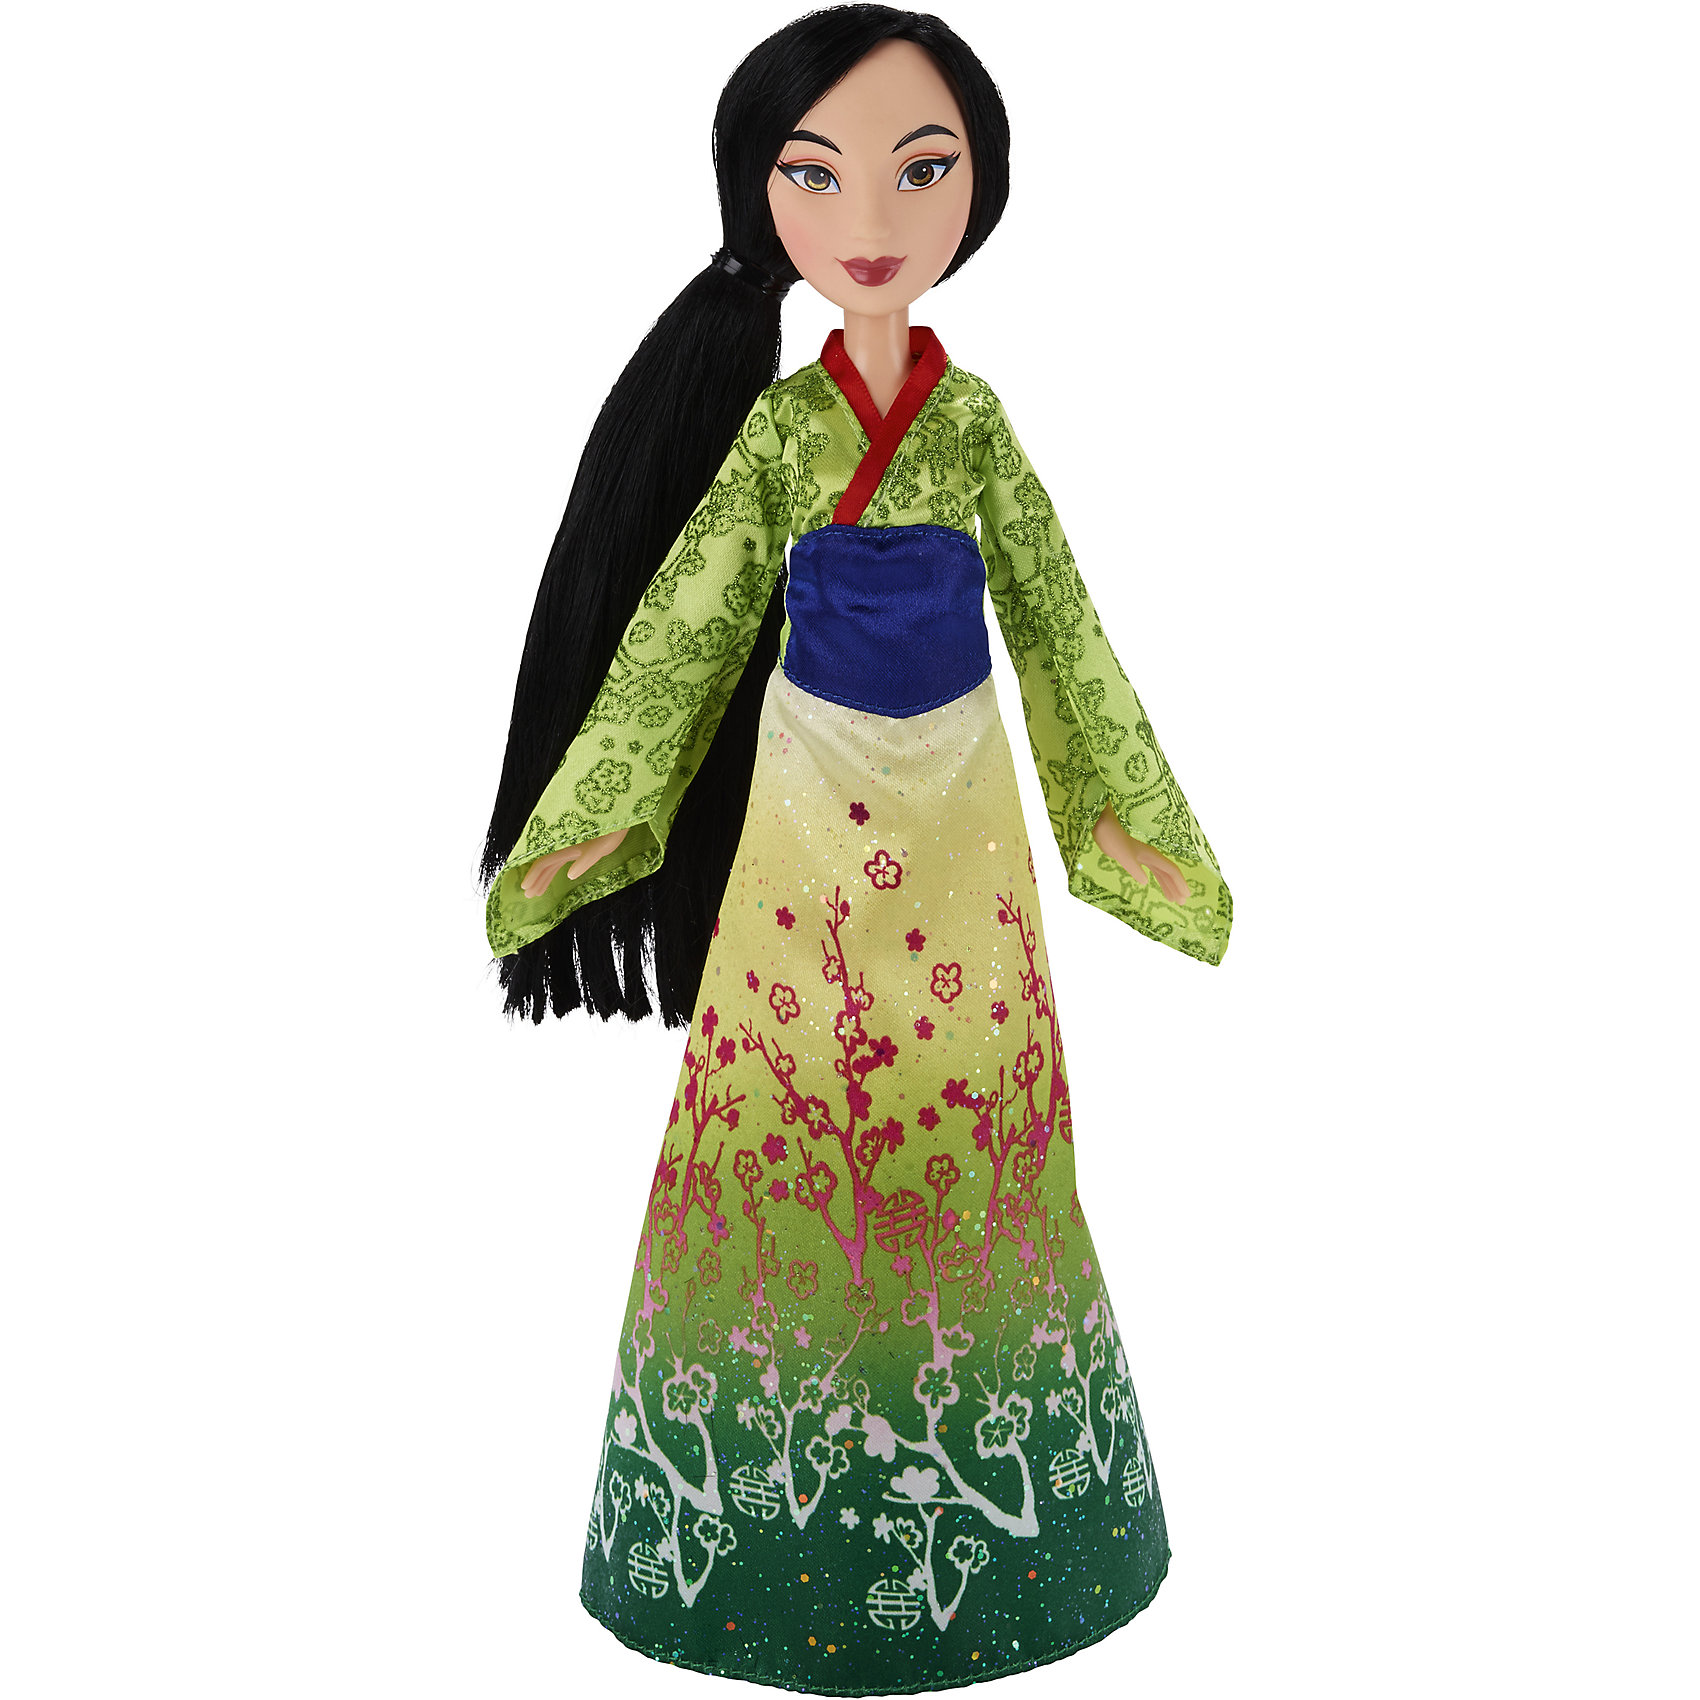 Hasbro Кукла Принцесса Мулан, Принцессы Дисней, B6447/B5827 hasbro кукла белоснежка принцессы дисней